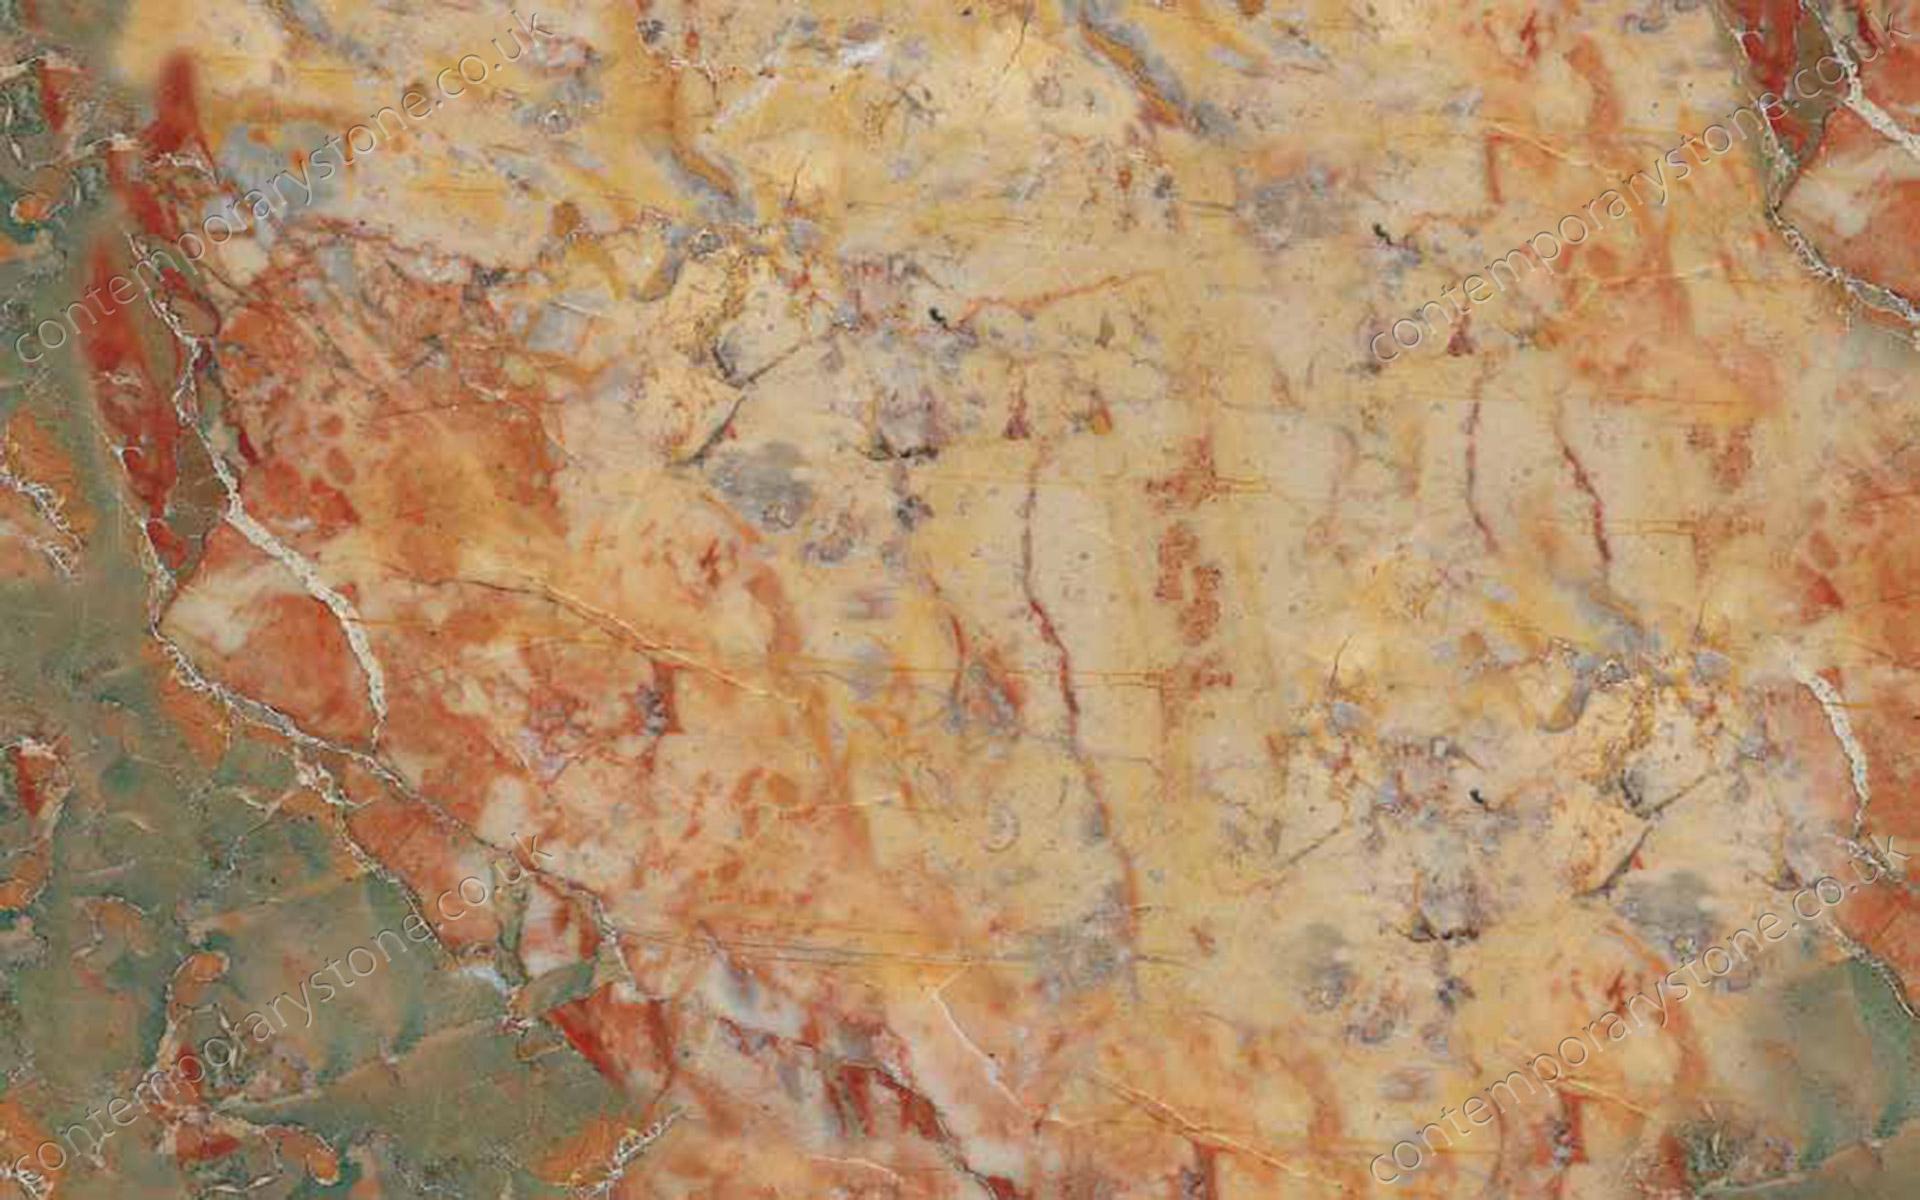 Sarrancolin marble close-up